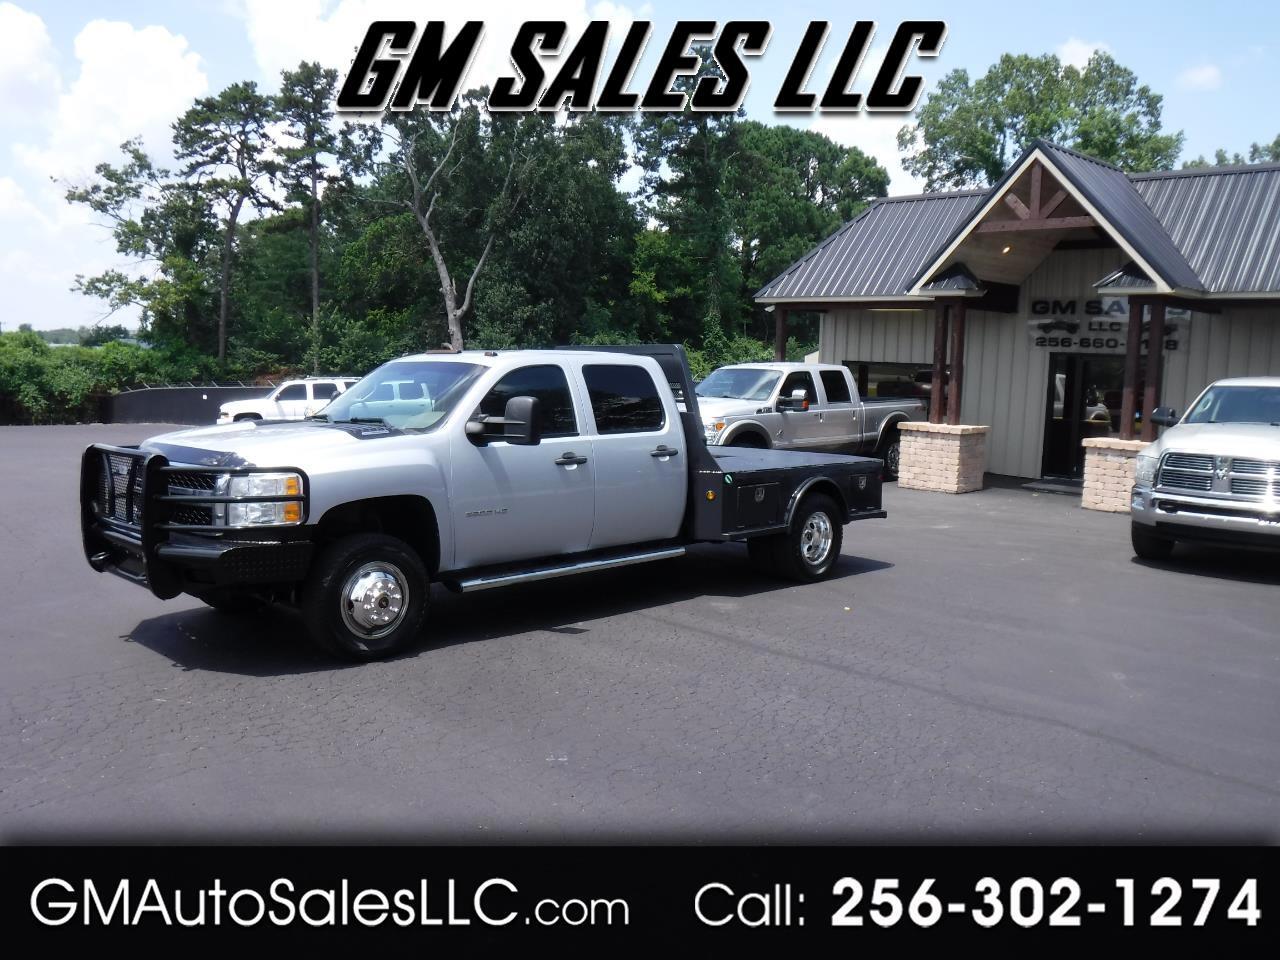 "2013 Chevrolet Silverado 3500HD 4WD Crew Cab 167.7"" Work Truck"